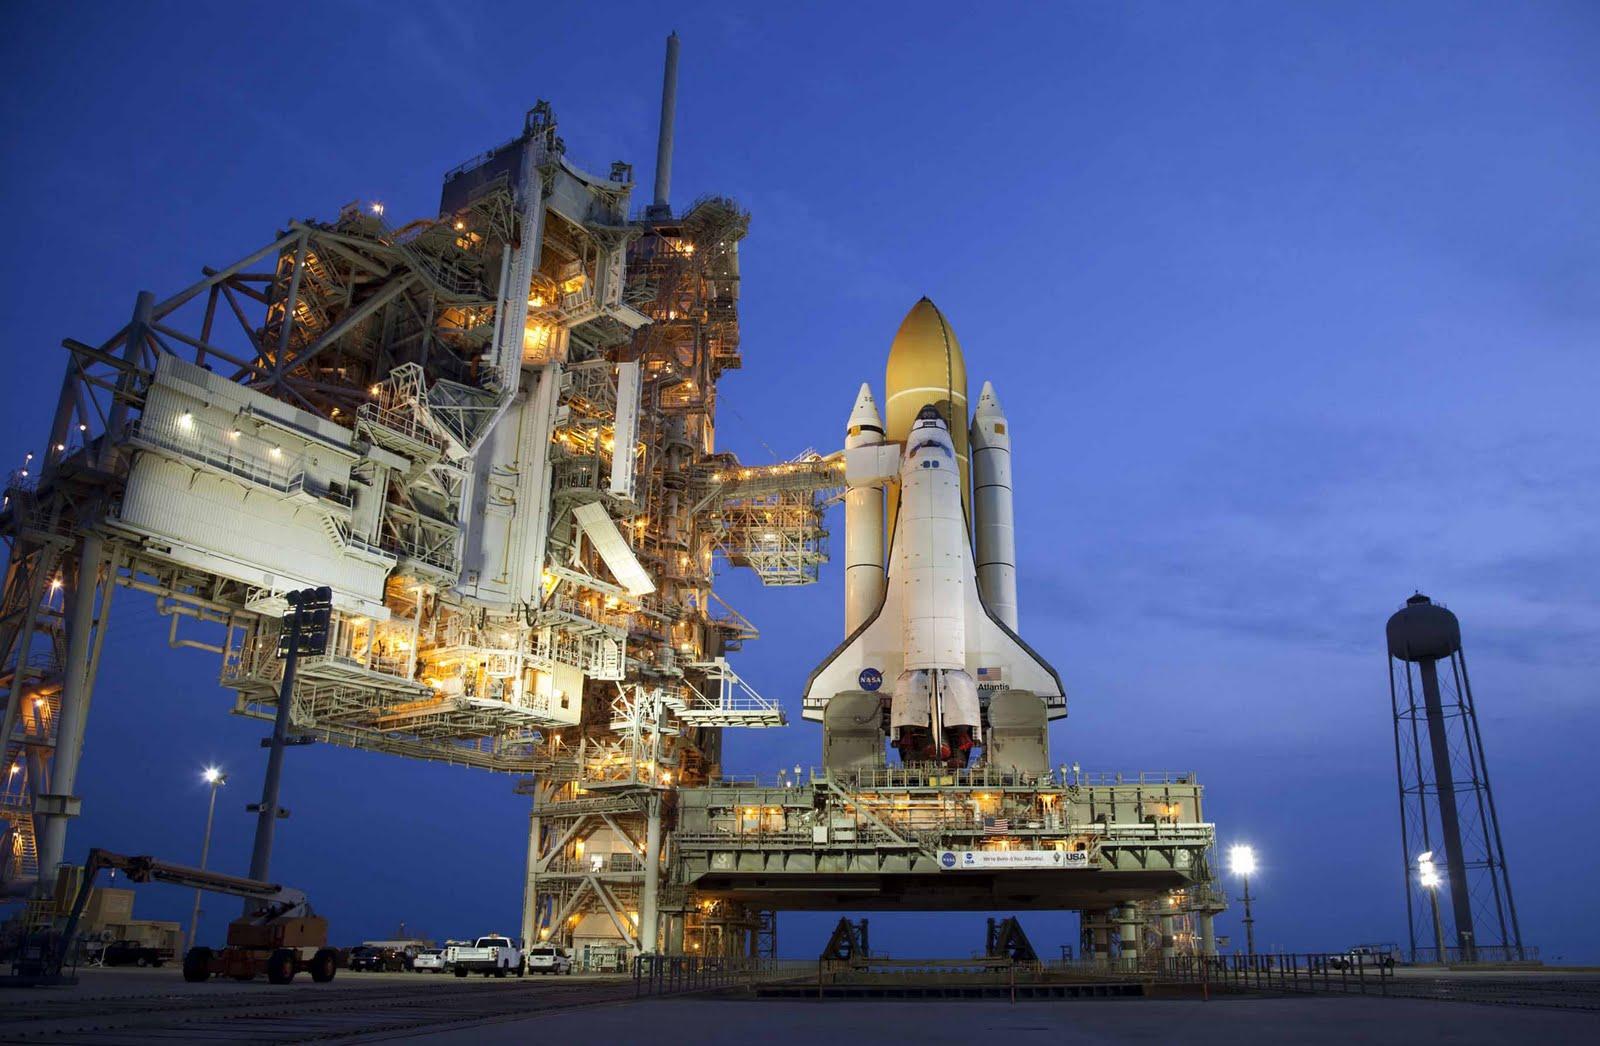 space shuttle astronaut deaths - photo #23